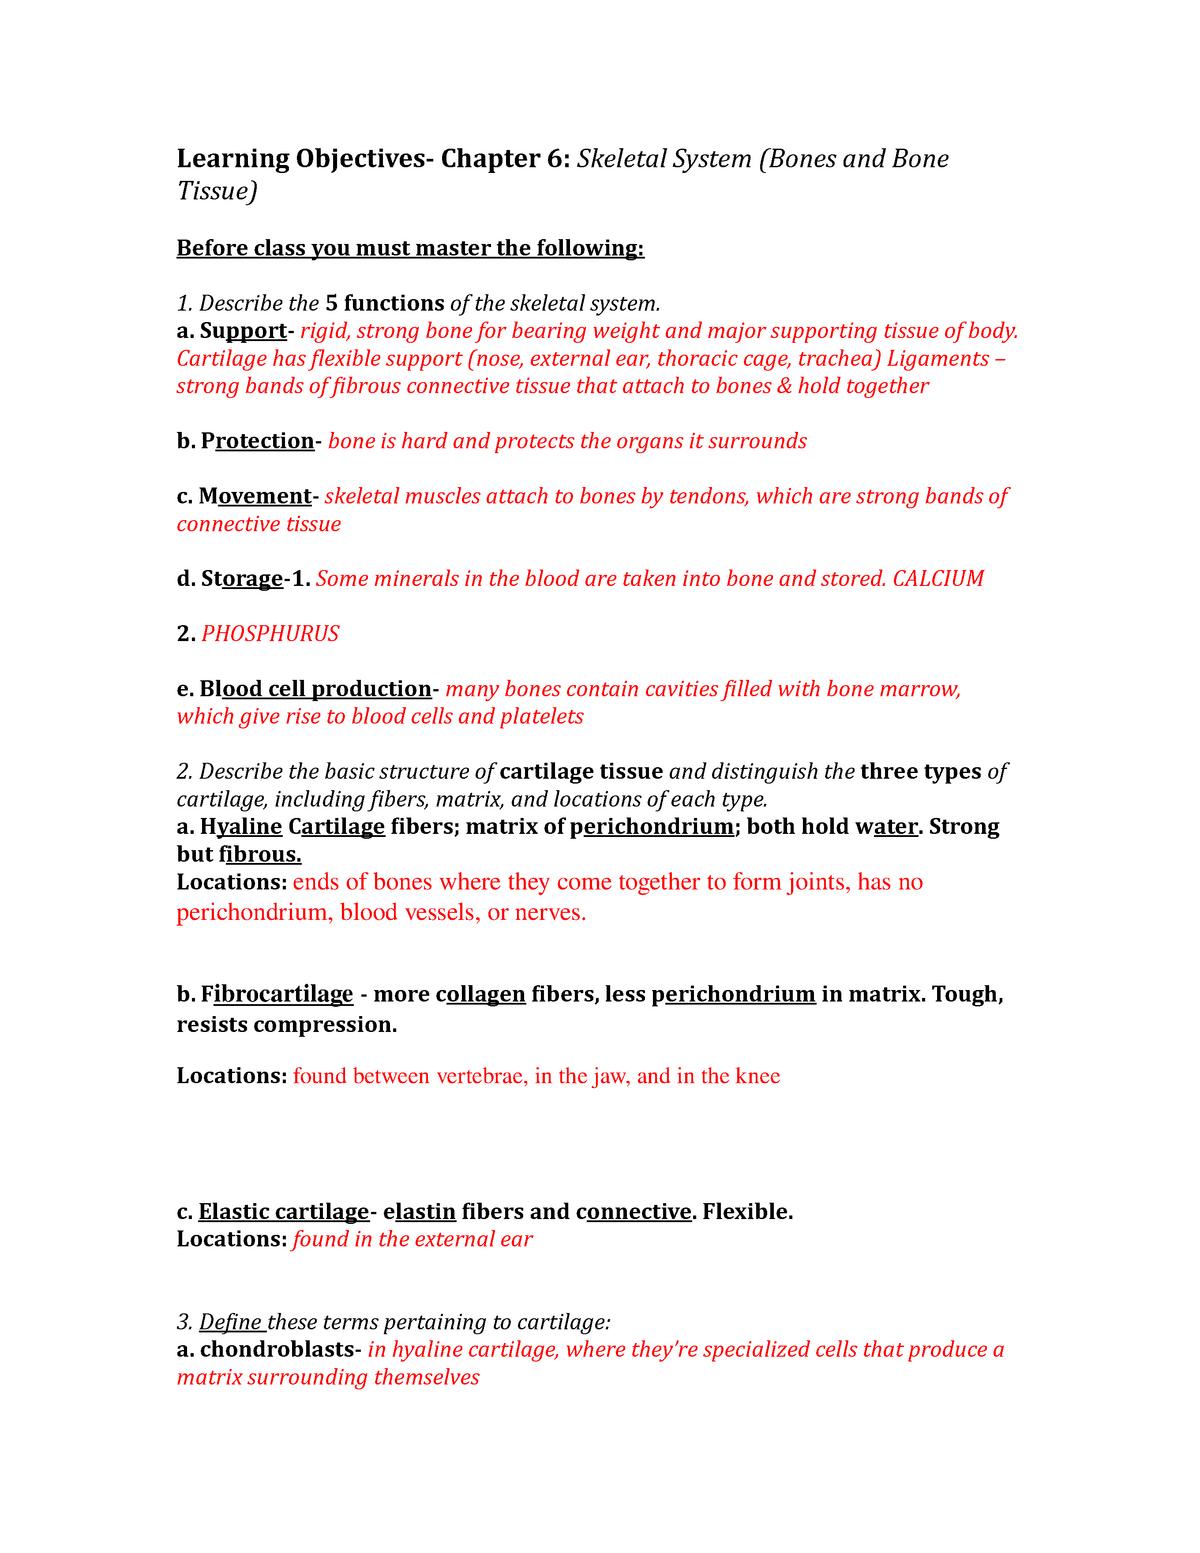 A P1 Skeletal System Biol2001c Anatomy And Physiology I Studocu